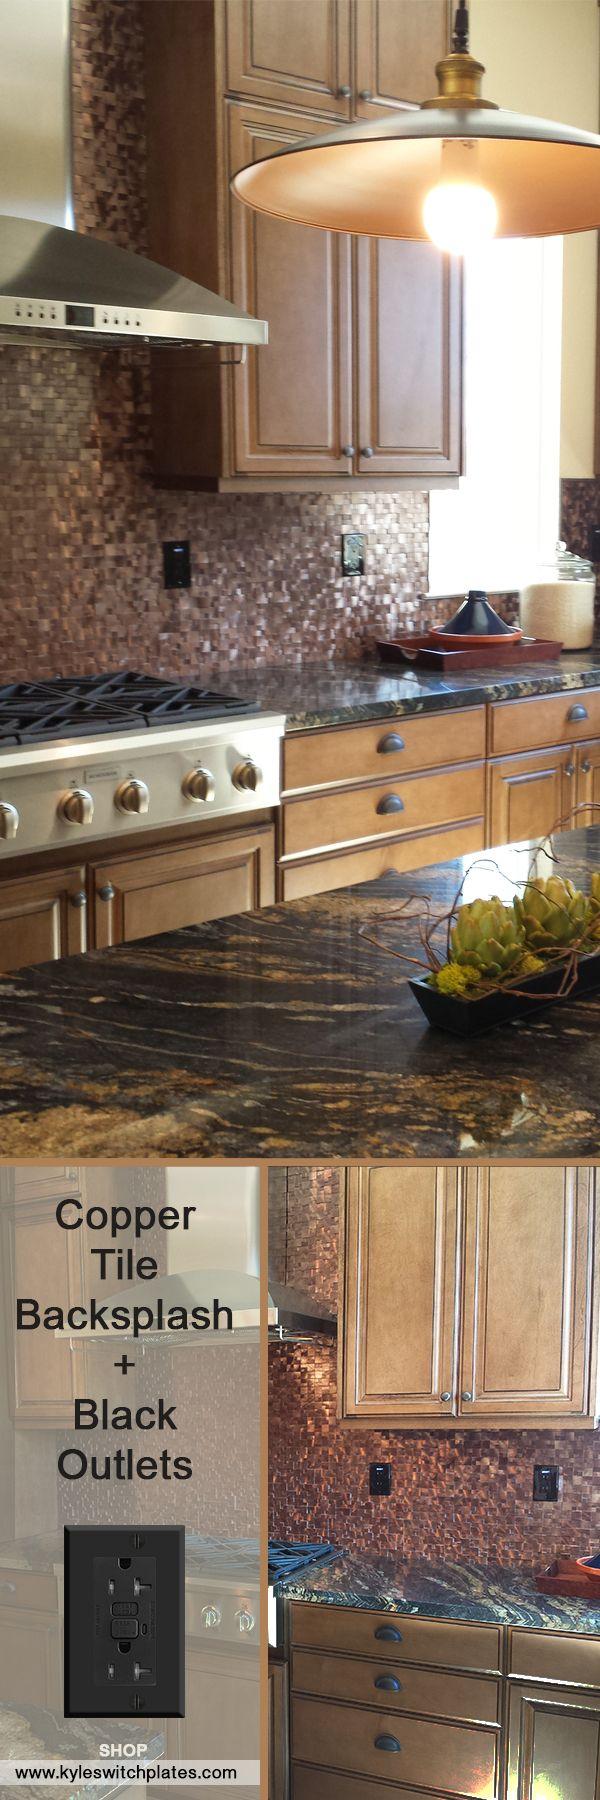 Best 25 copper tile backsplash ideas on pinterest copper copper tile backsplash black switch plates dailygadgetfo Image collections